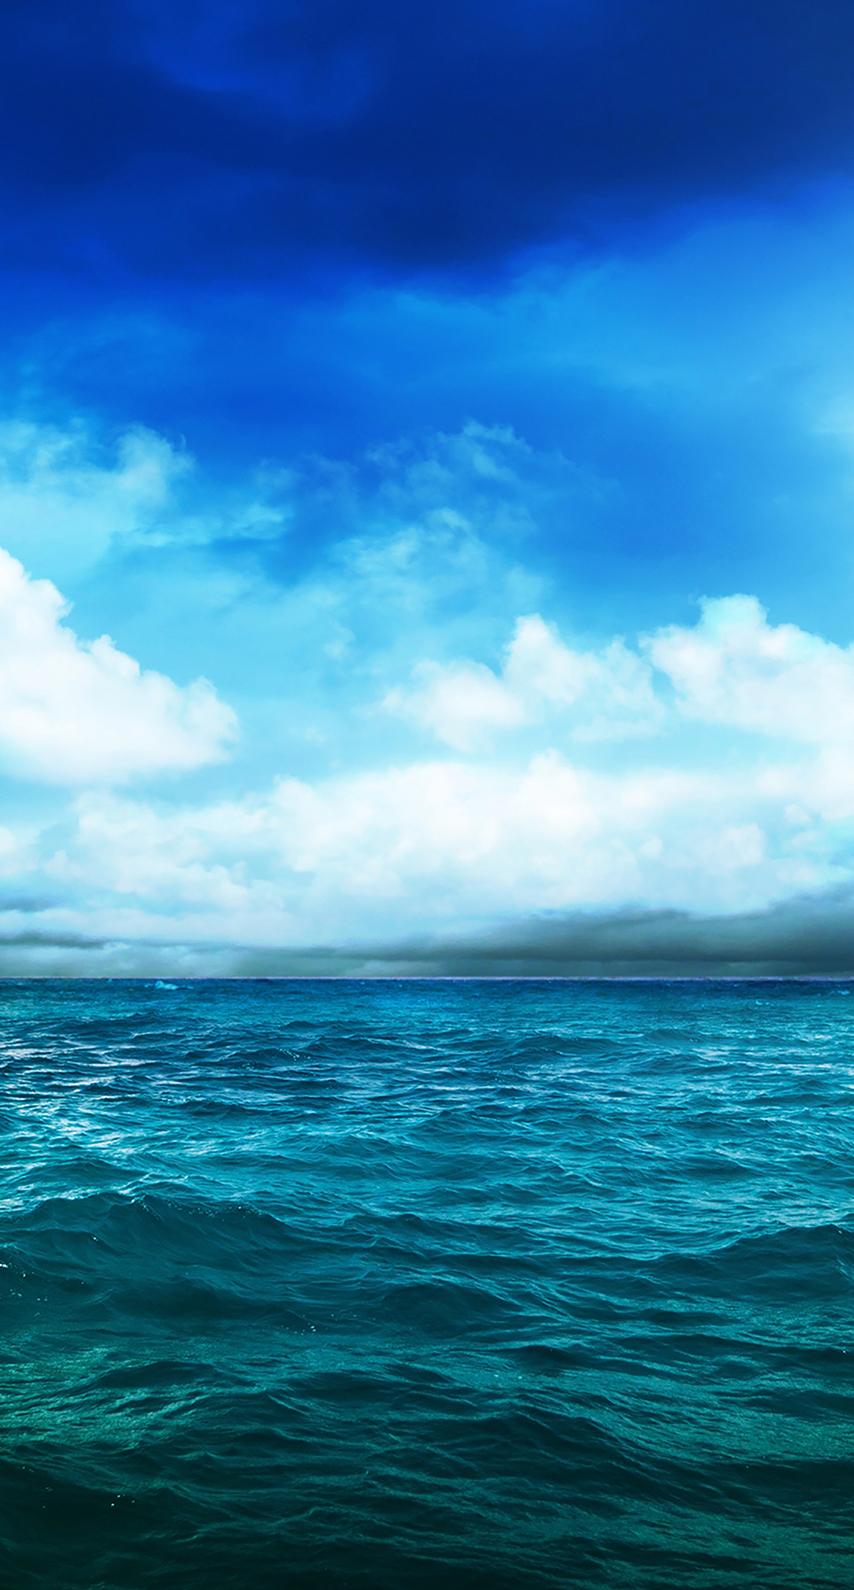 summer, wave